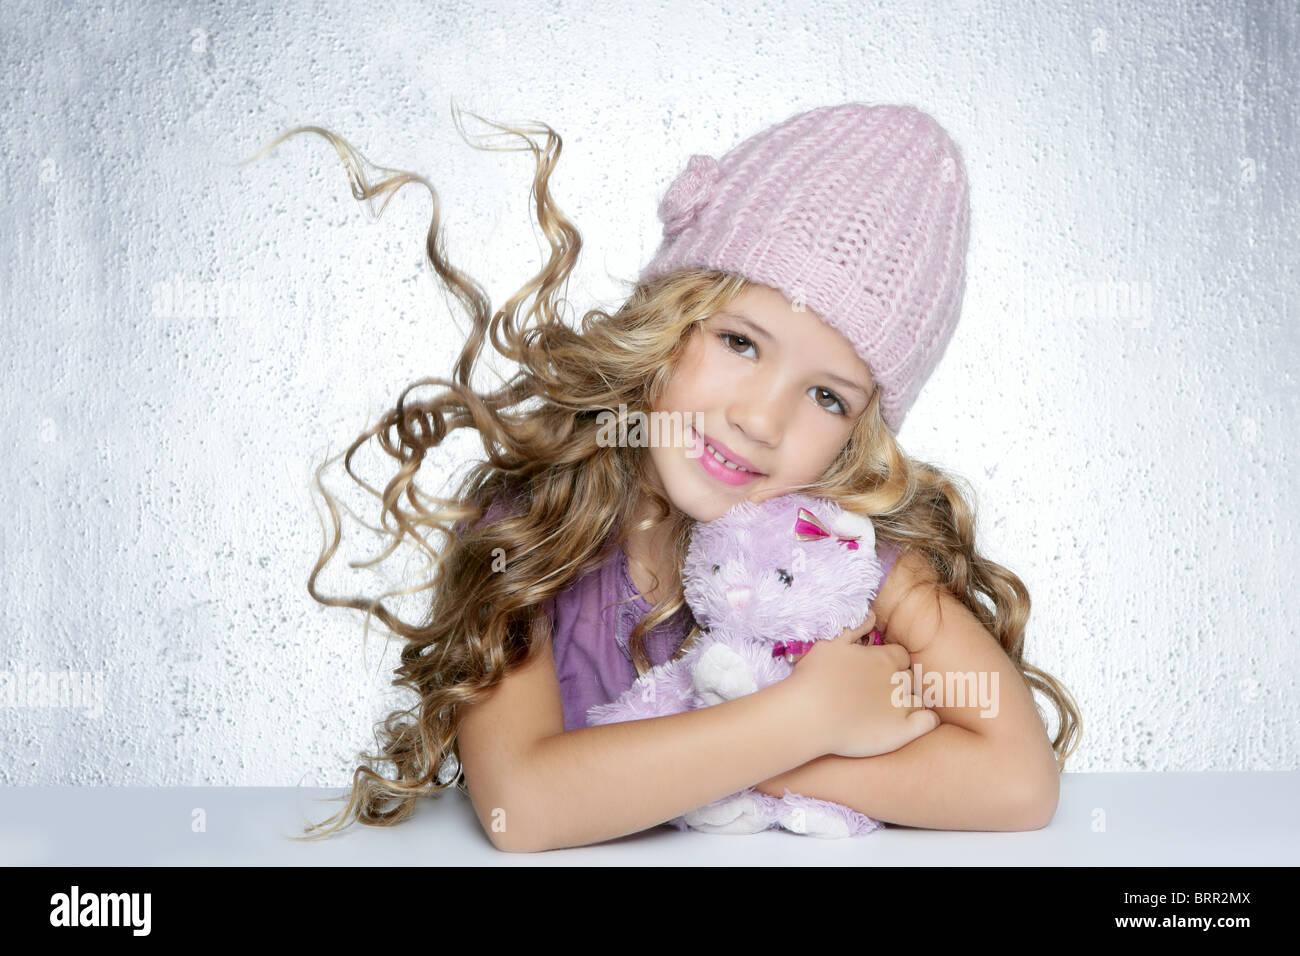 winter fashion cap little girl hug teddy bear smiling silver background -  Stock Image fe562eae0b87